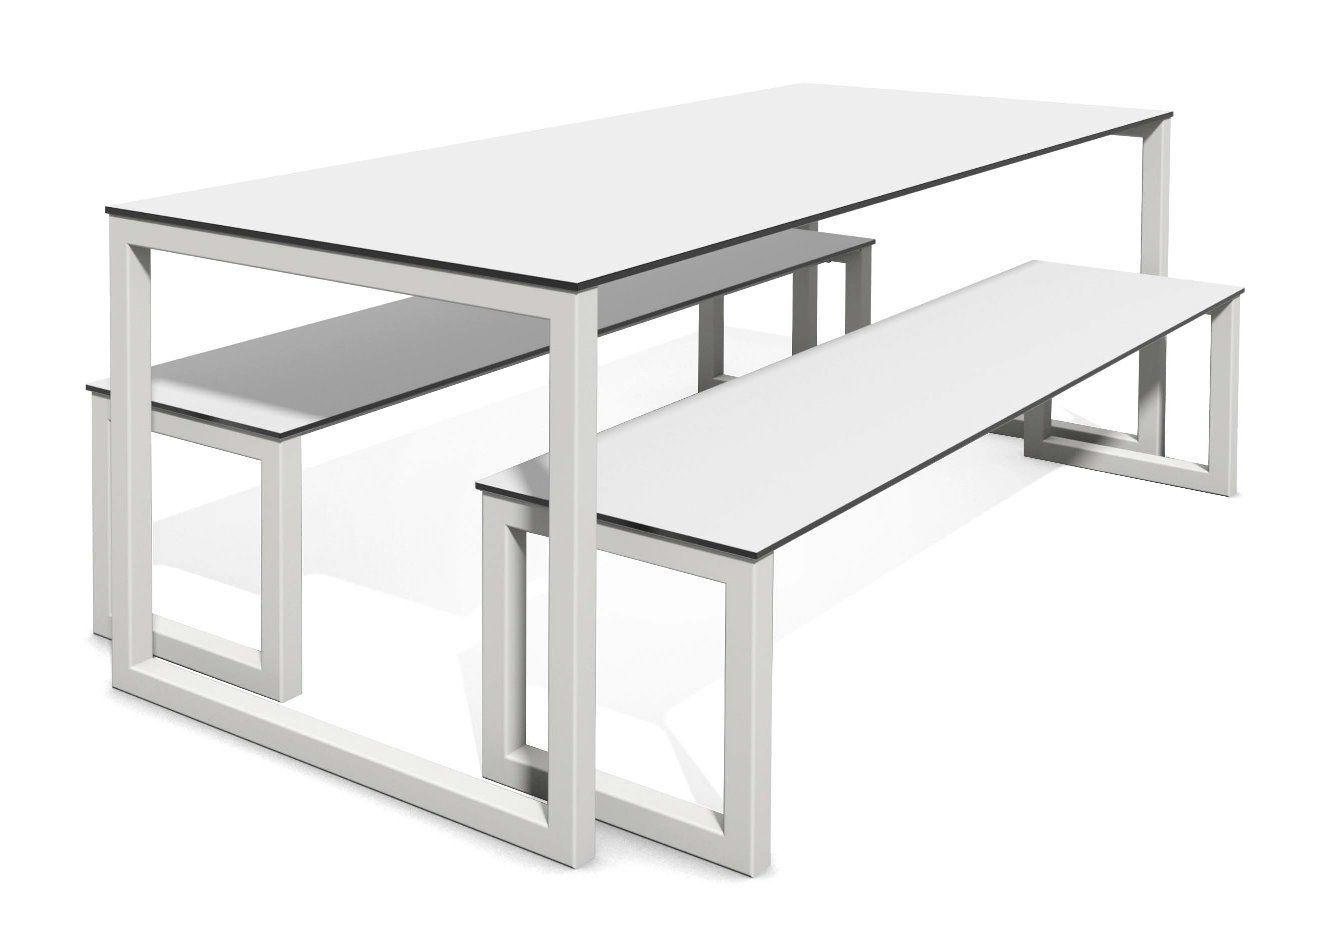 Panca Tavolo Da Esterno: Tavolo da giardino arredamento e ...